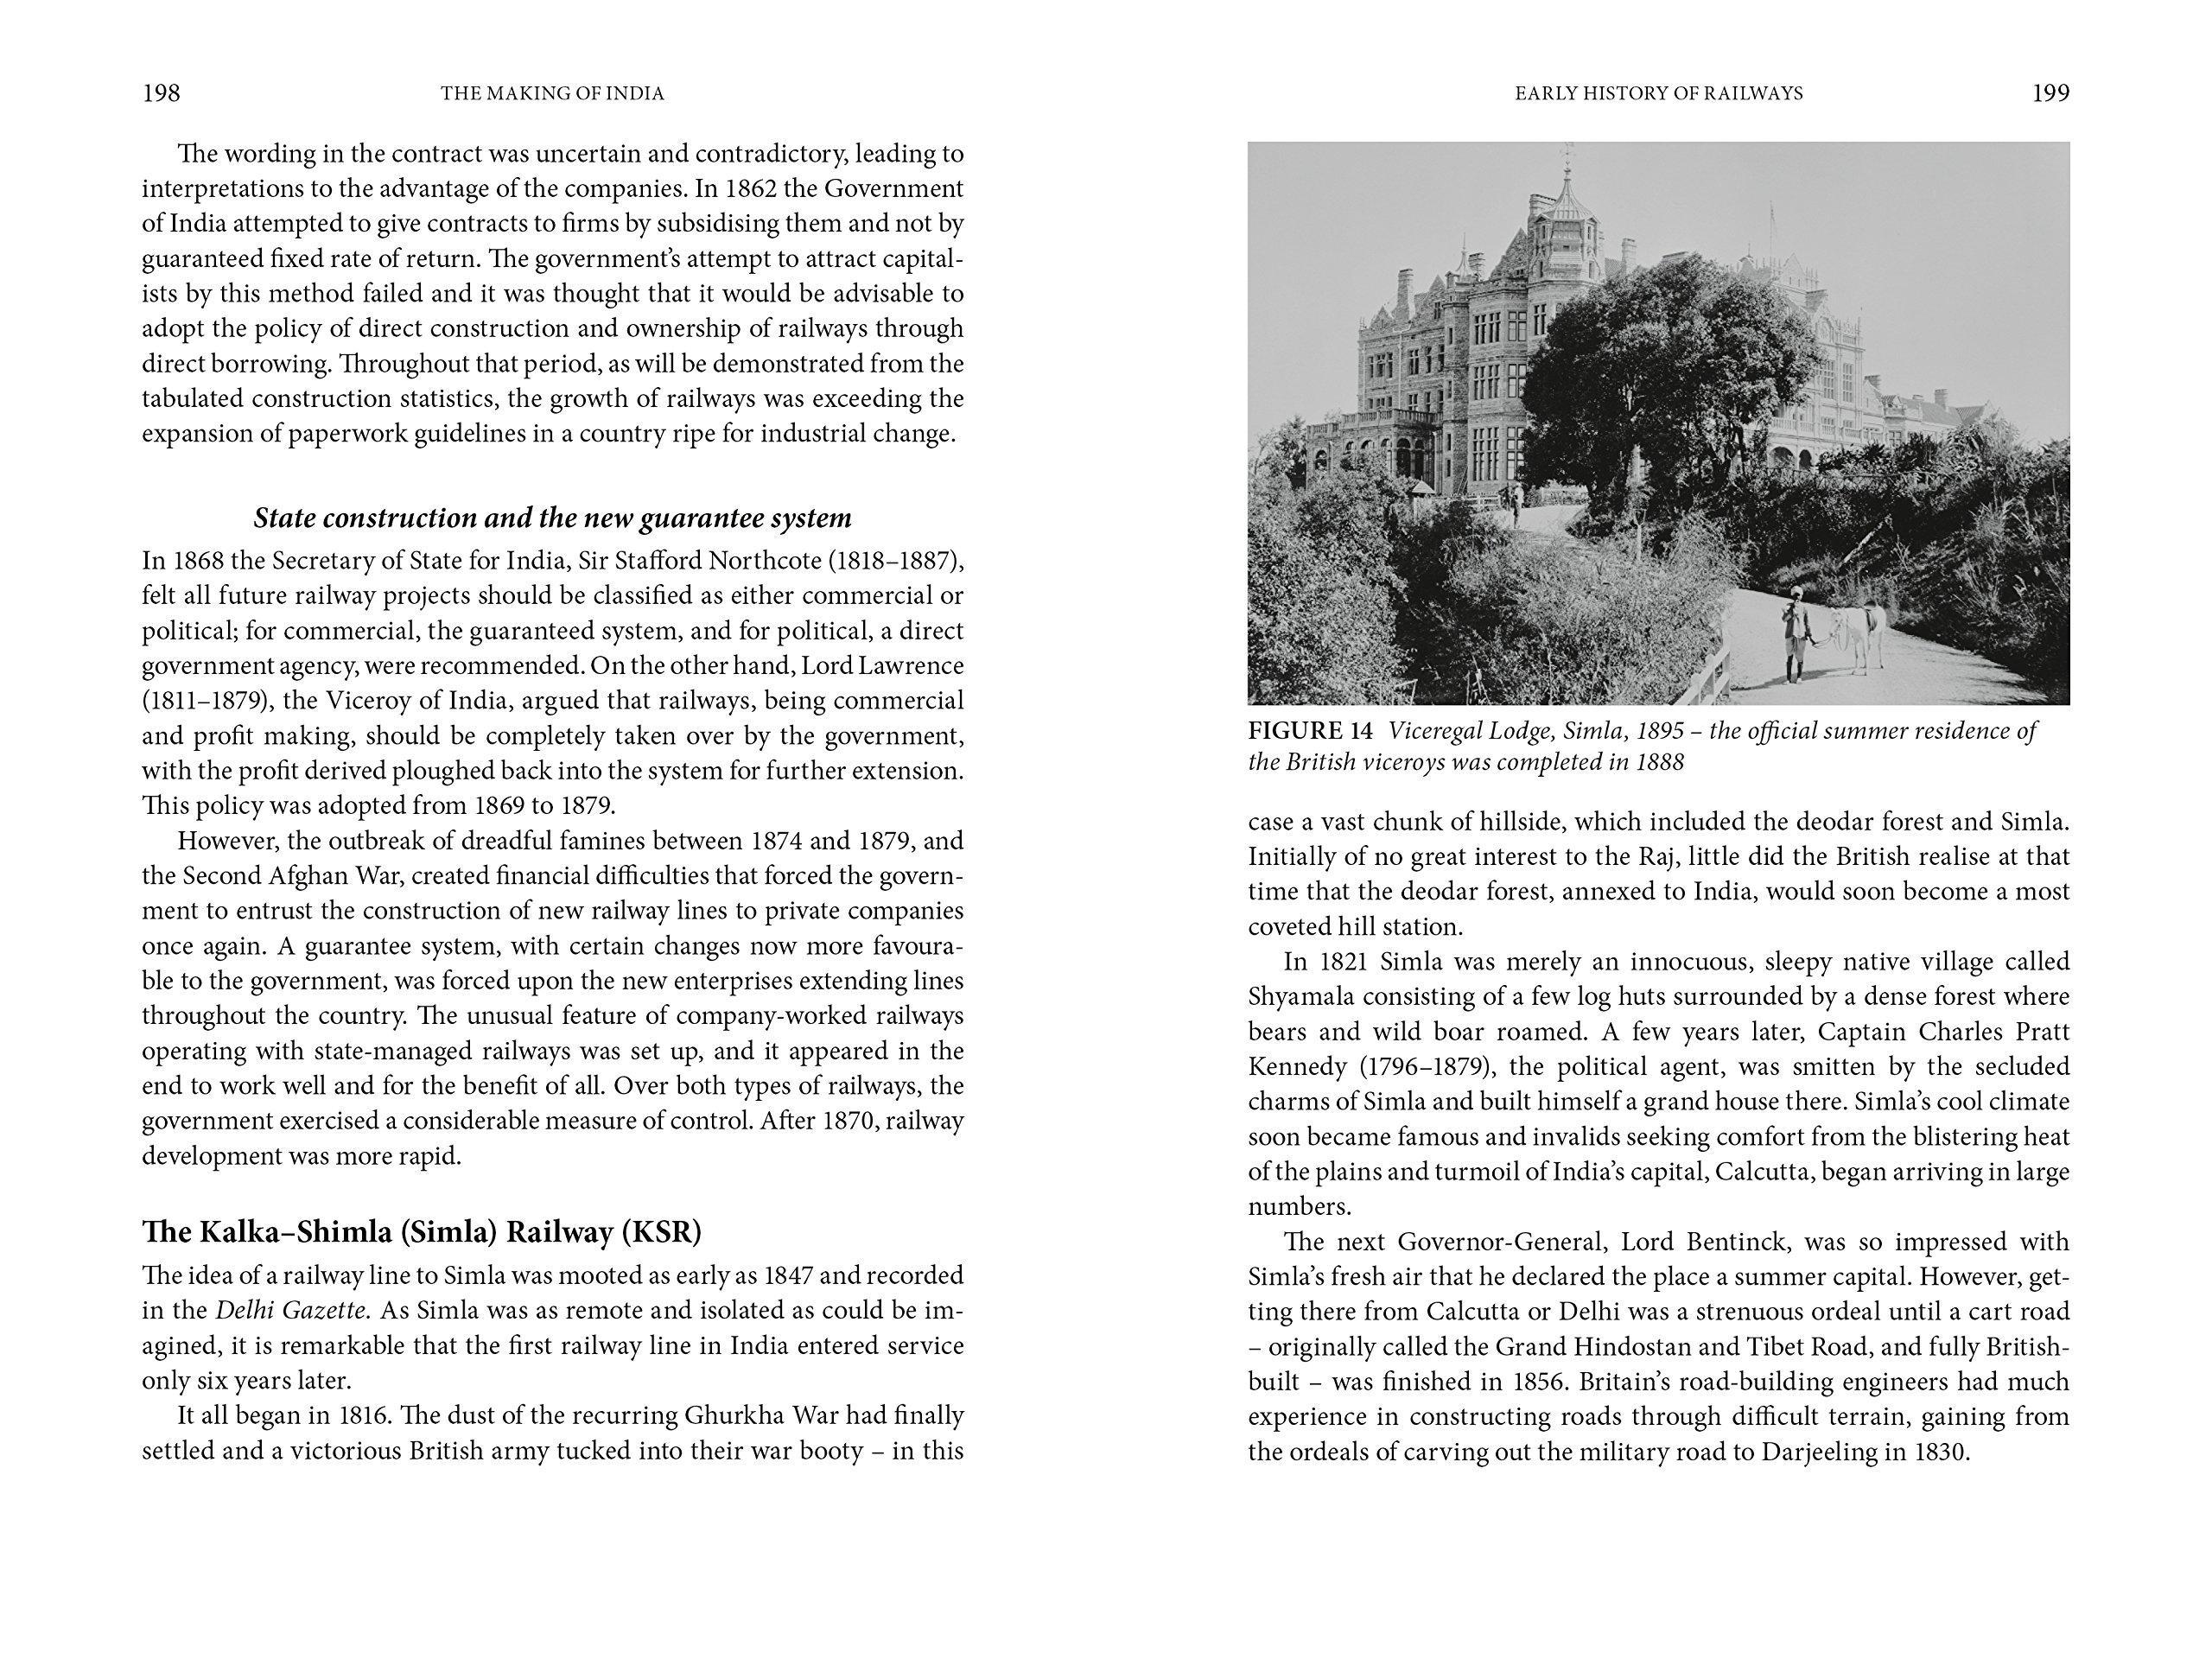 The Making Of India: The Untold Story Of British Enterprise: Amazon:  Kartar Lalvani: 9781472924827: Books